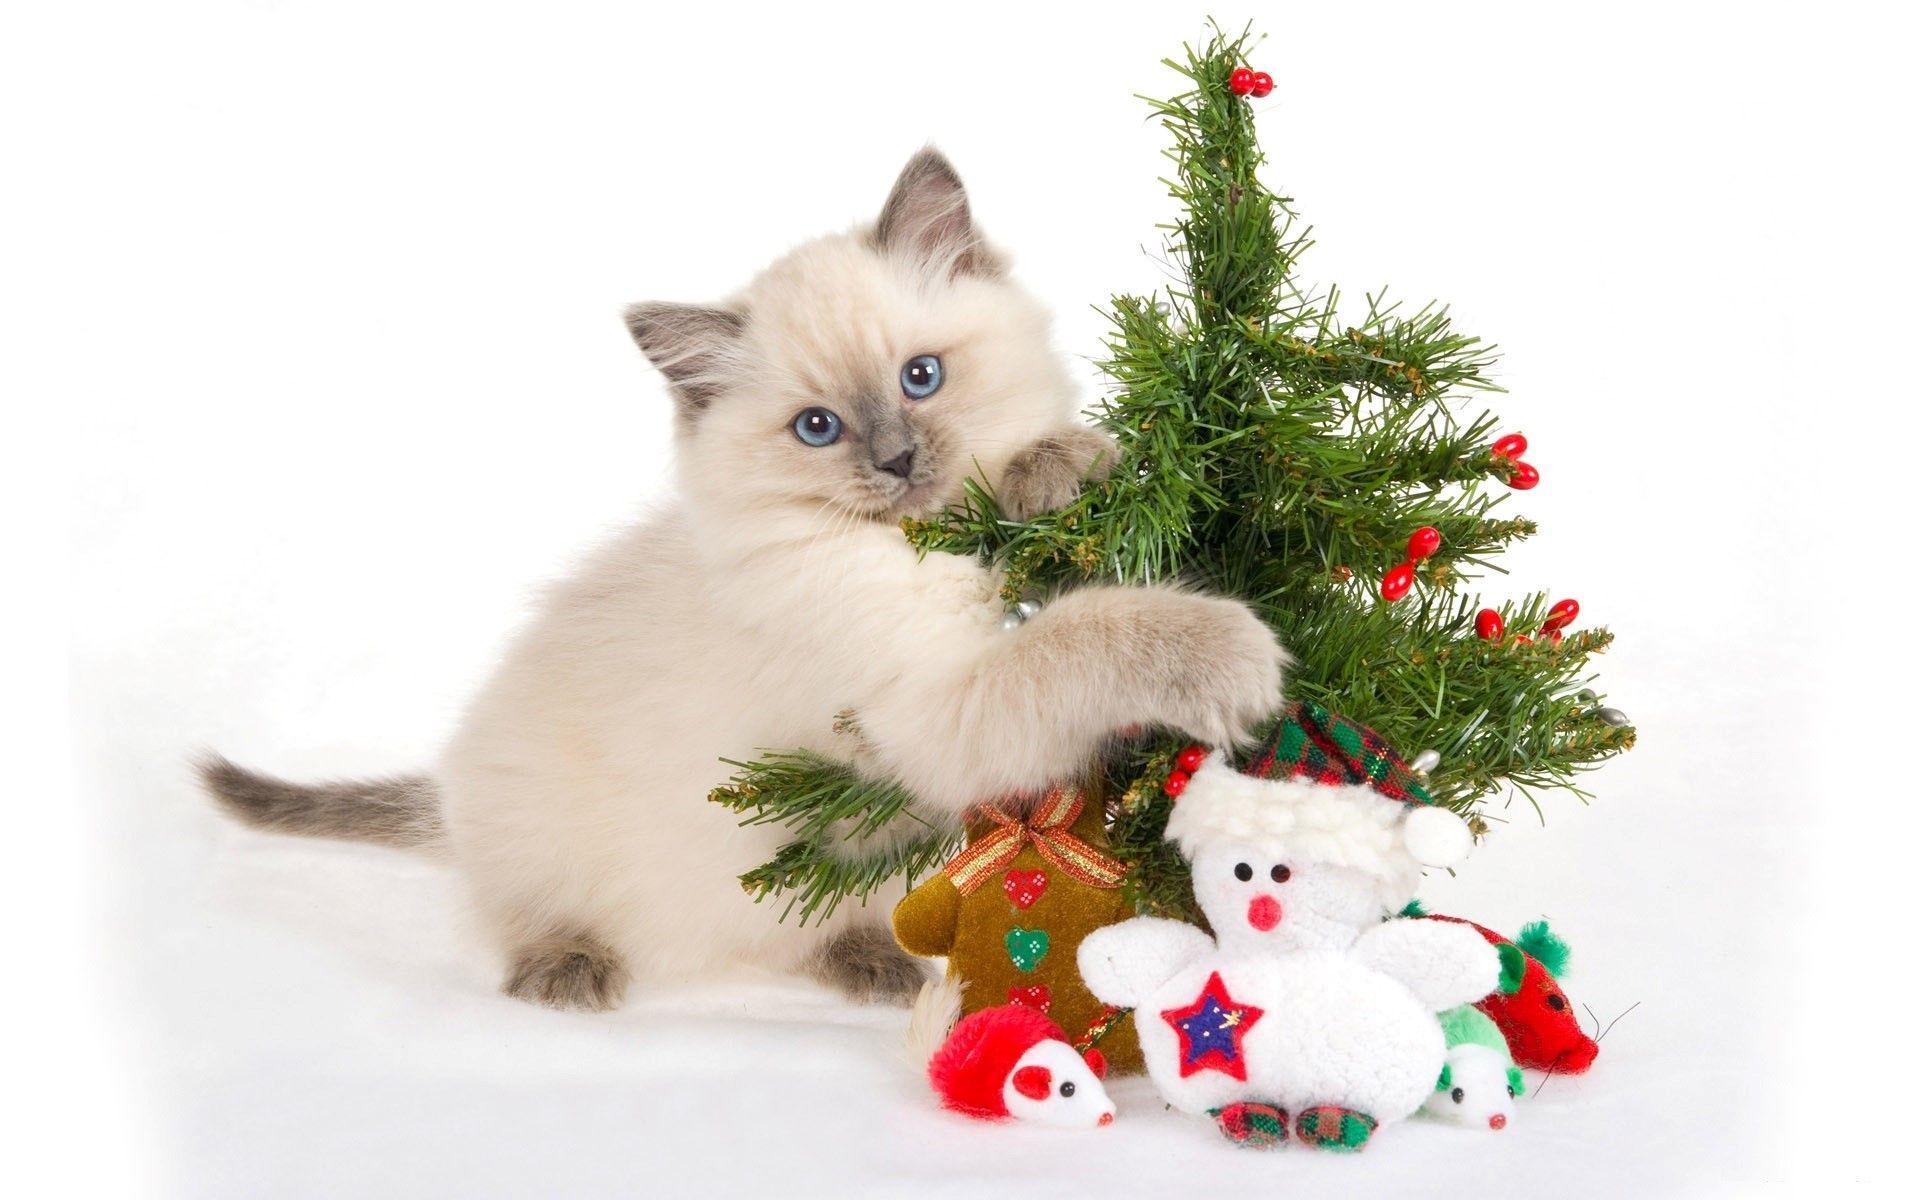 Cute Christmas Cat Wallpapers Top Free Cute Christmas Cat